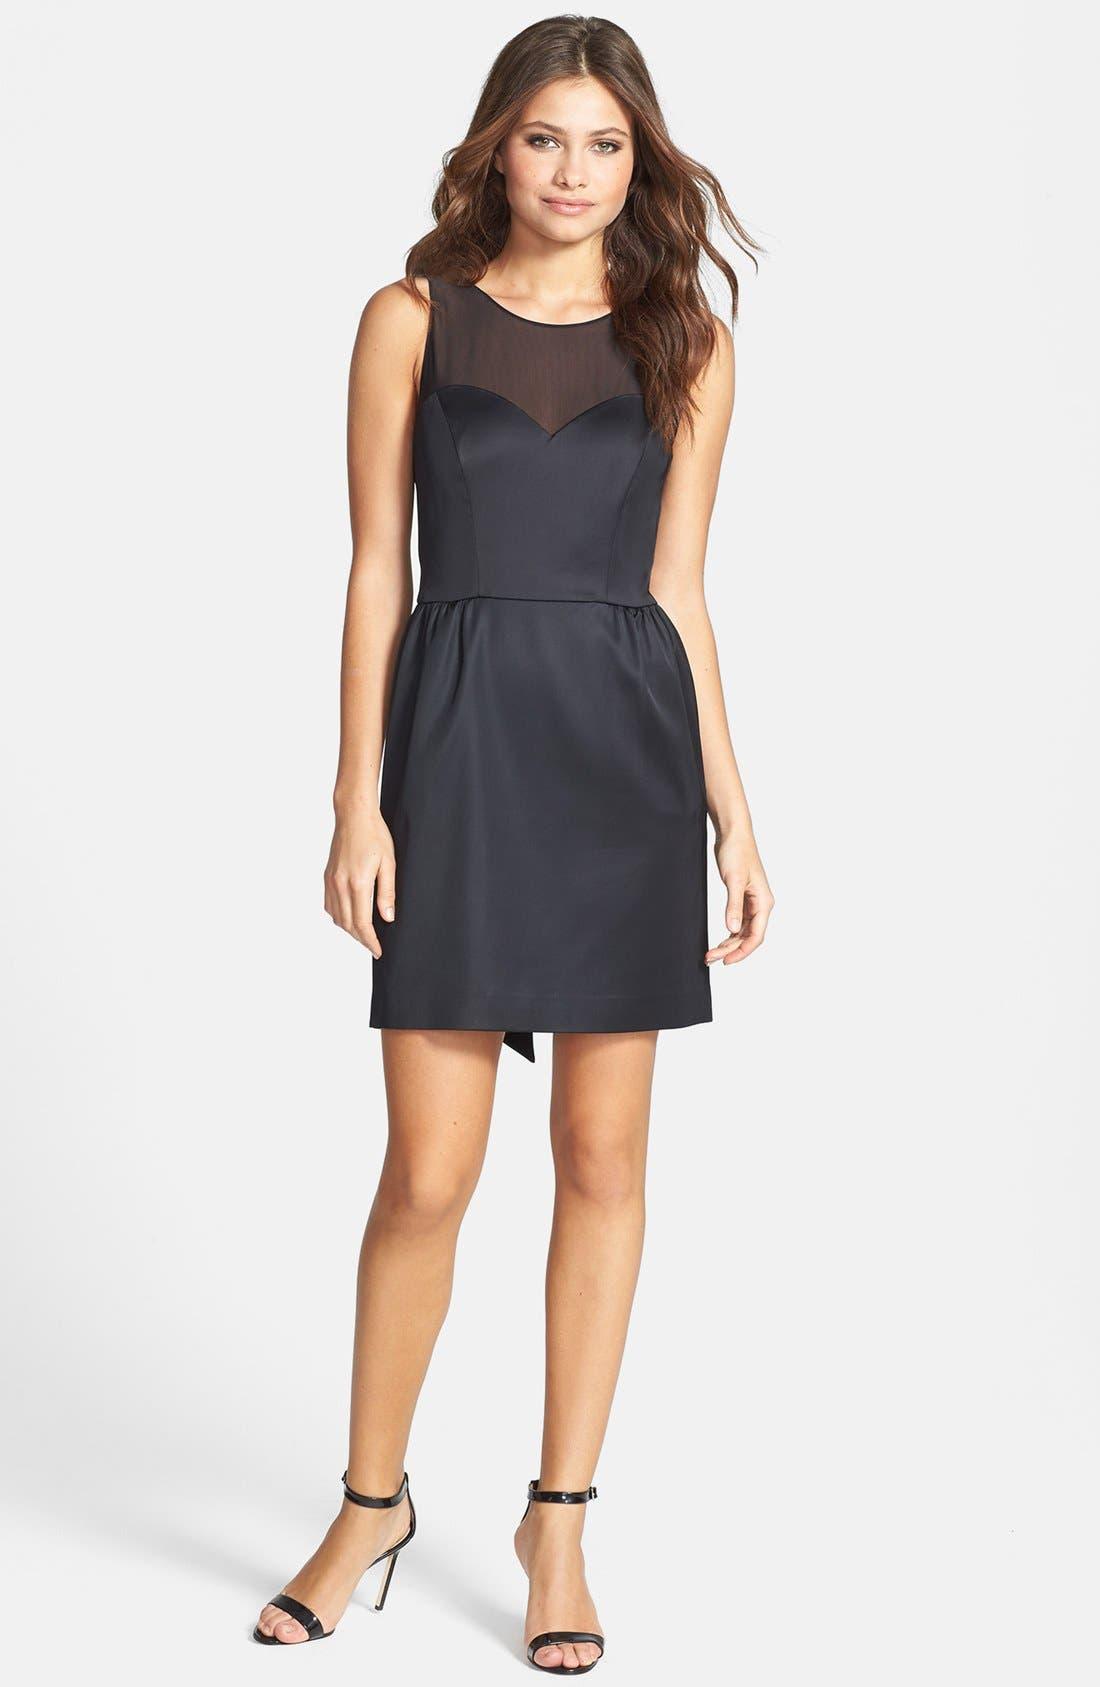 Alternate Image 1 Selected - ERIN erin fetherston 'Winona' Stretch Satin Dress